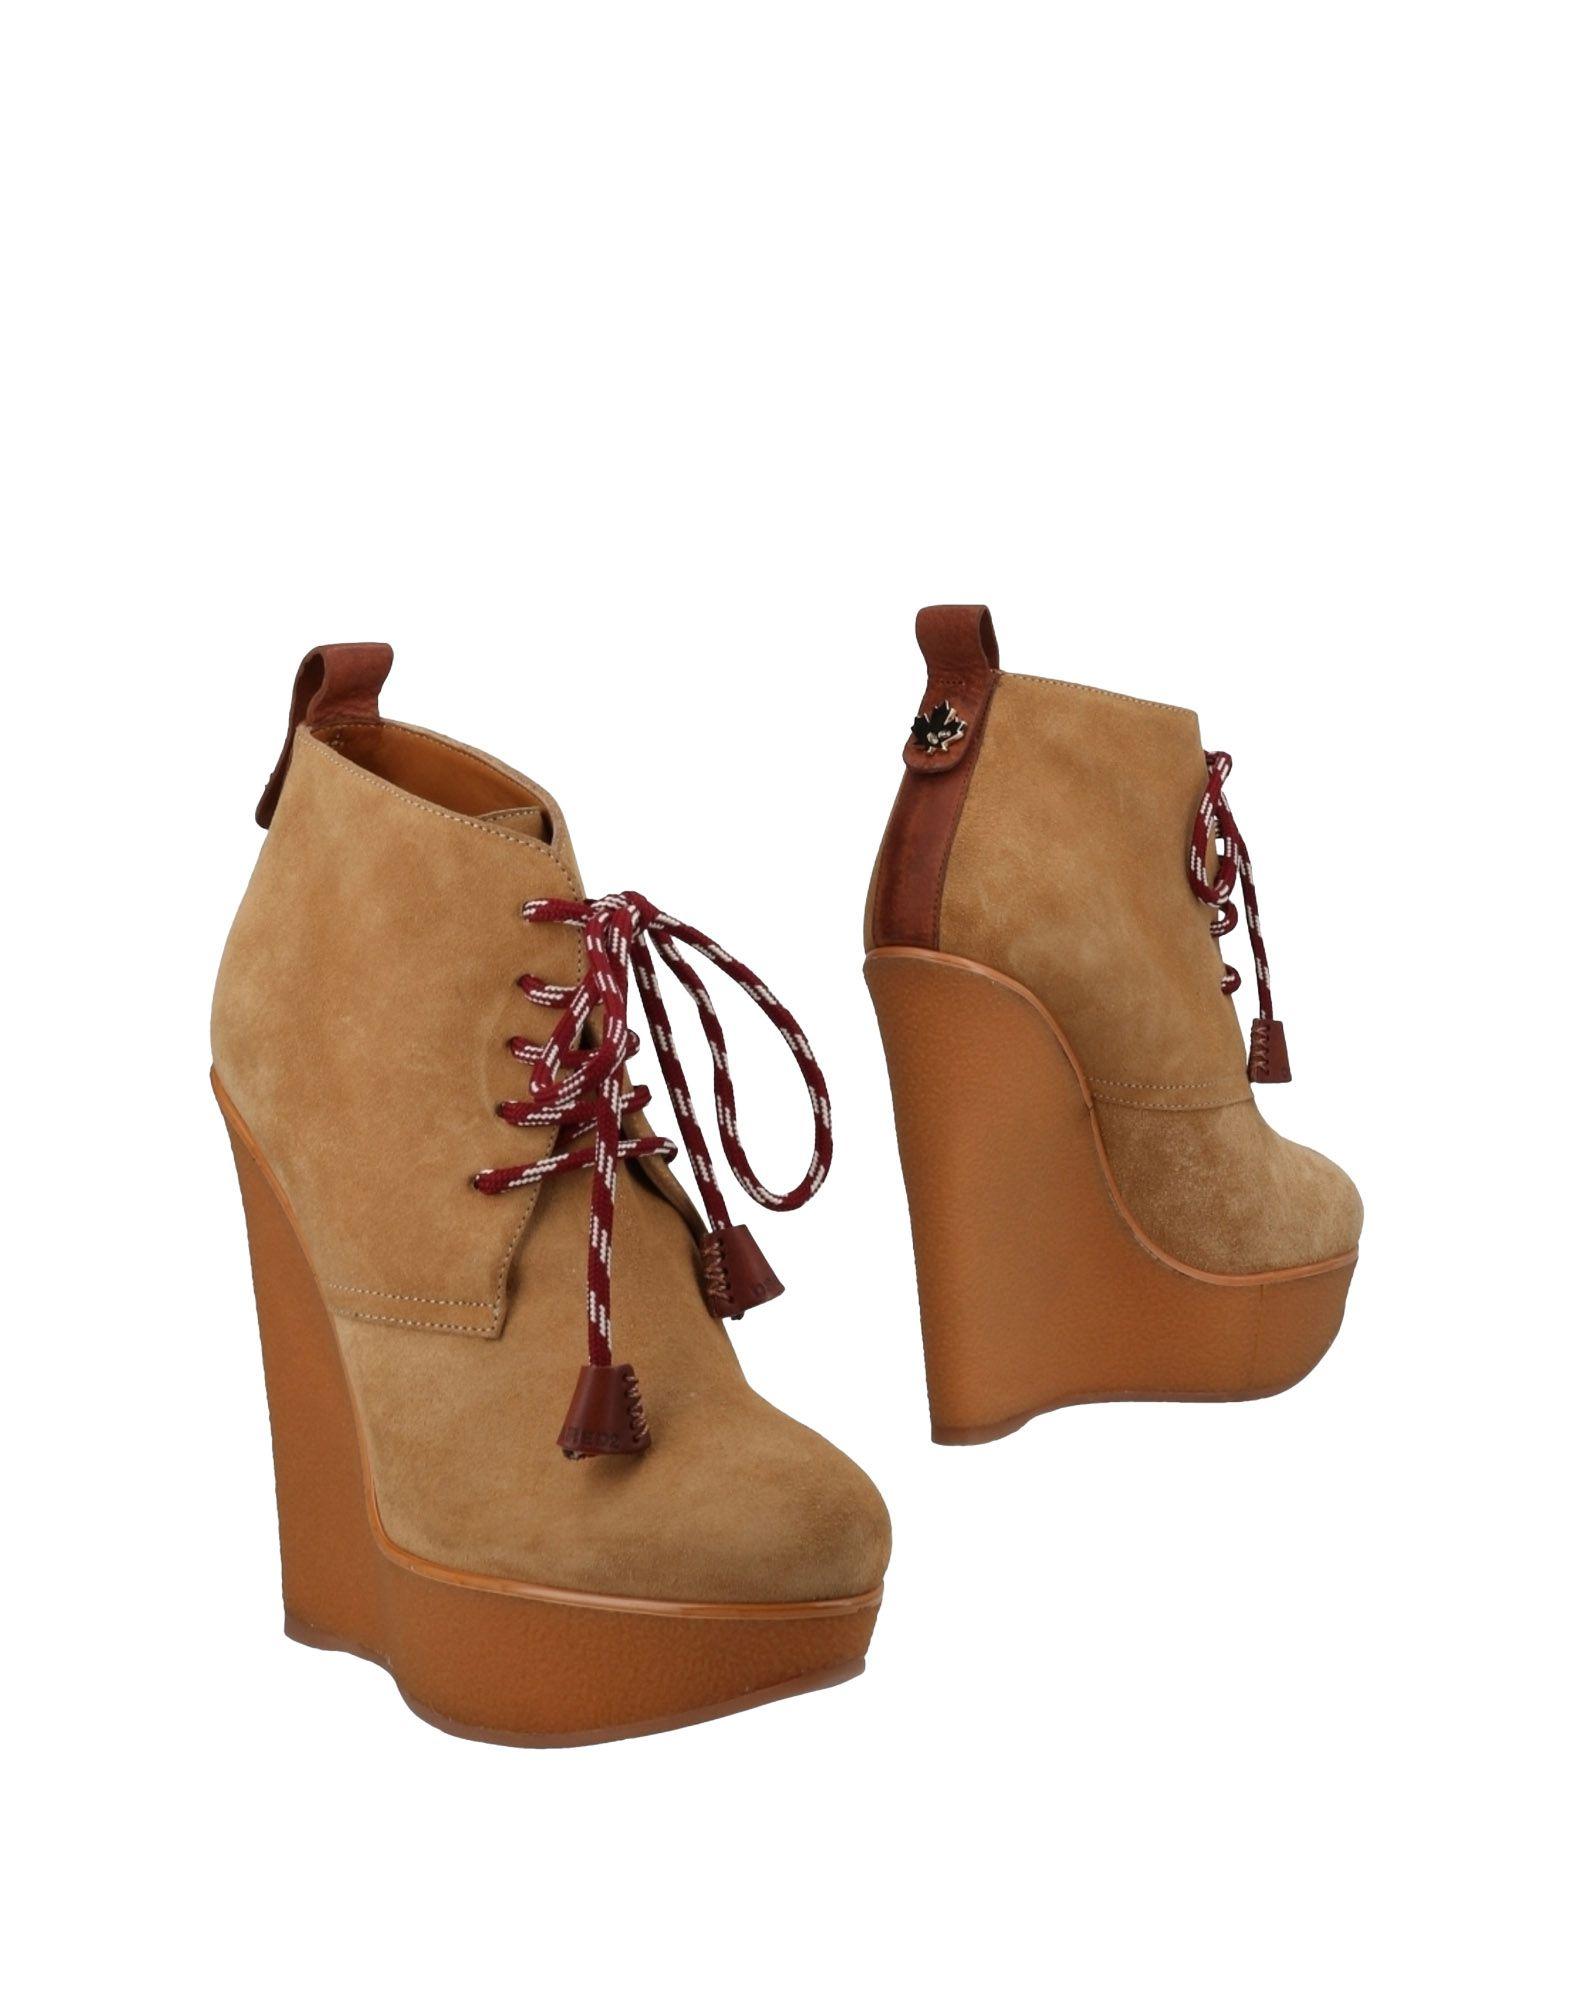 Dsquared2 Stiefelette Damen Schuhe  11487804FBGünstige gut aussehende Schuhe Damen 8dea79